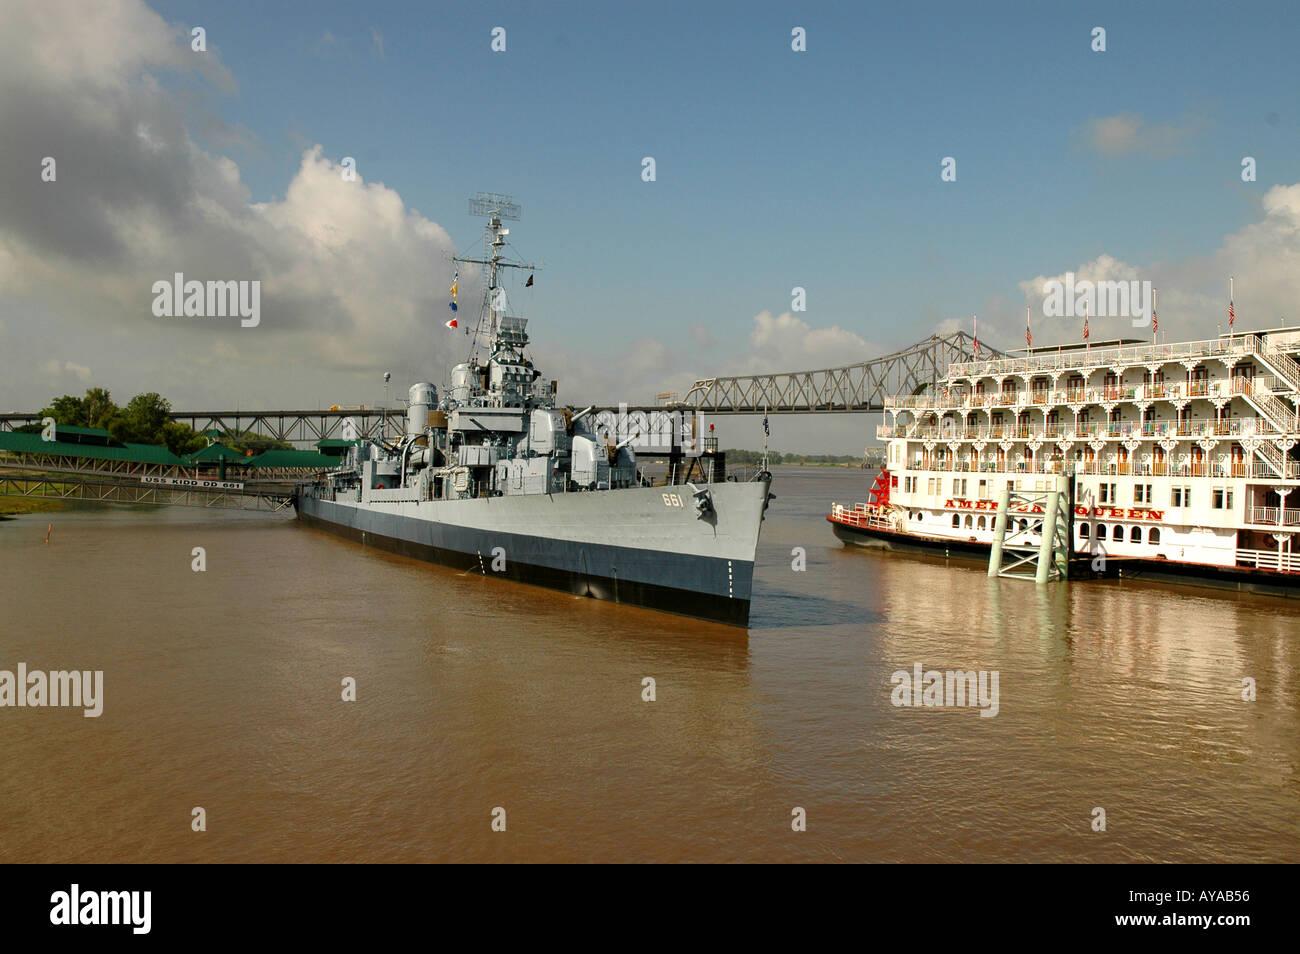 Baton Rouge LA Louisiana USS Kidd old fashioned steamboat - Stock Image